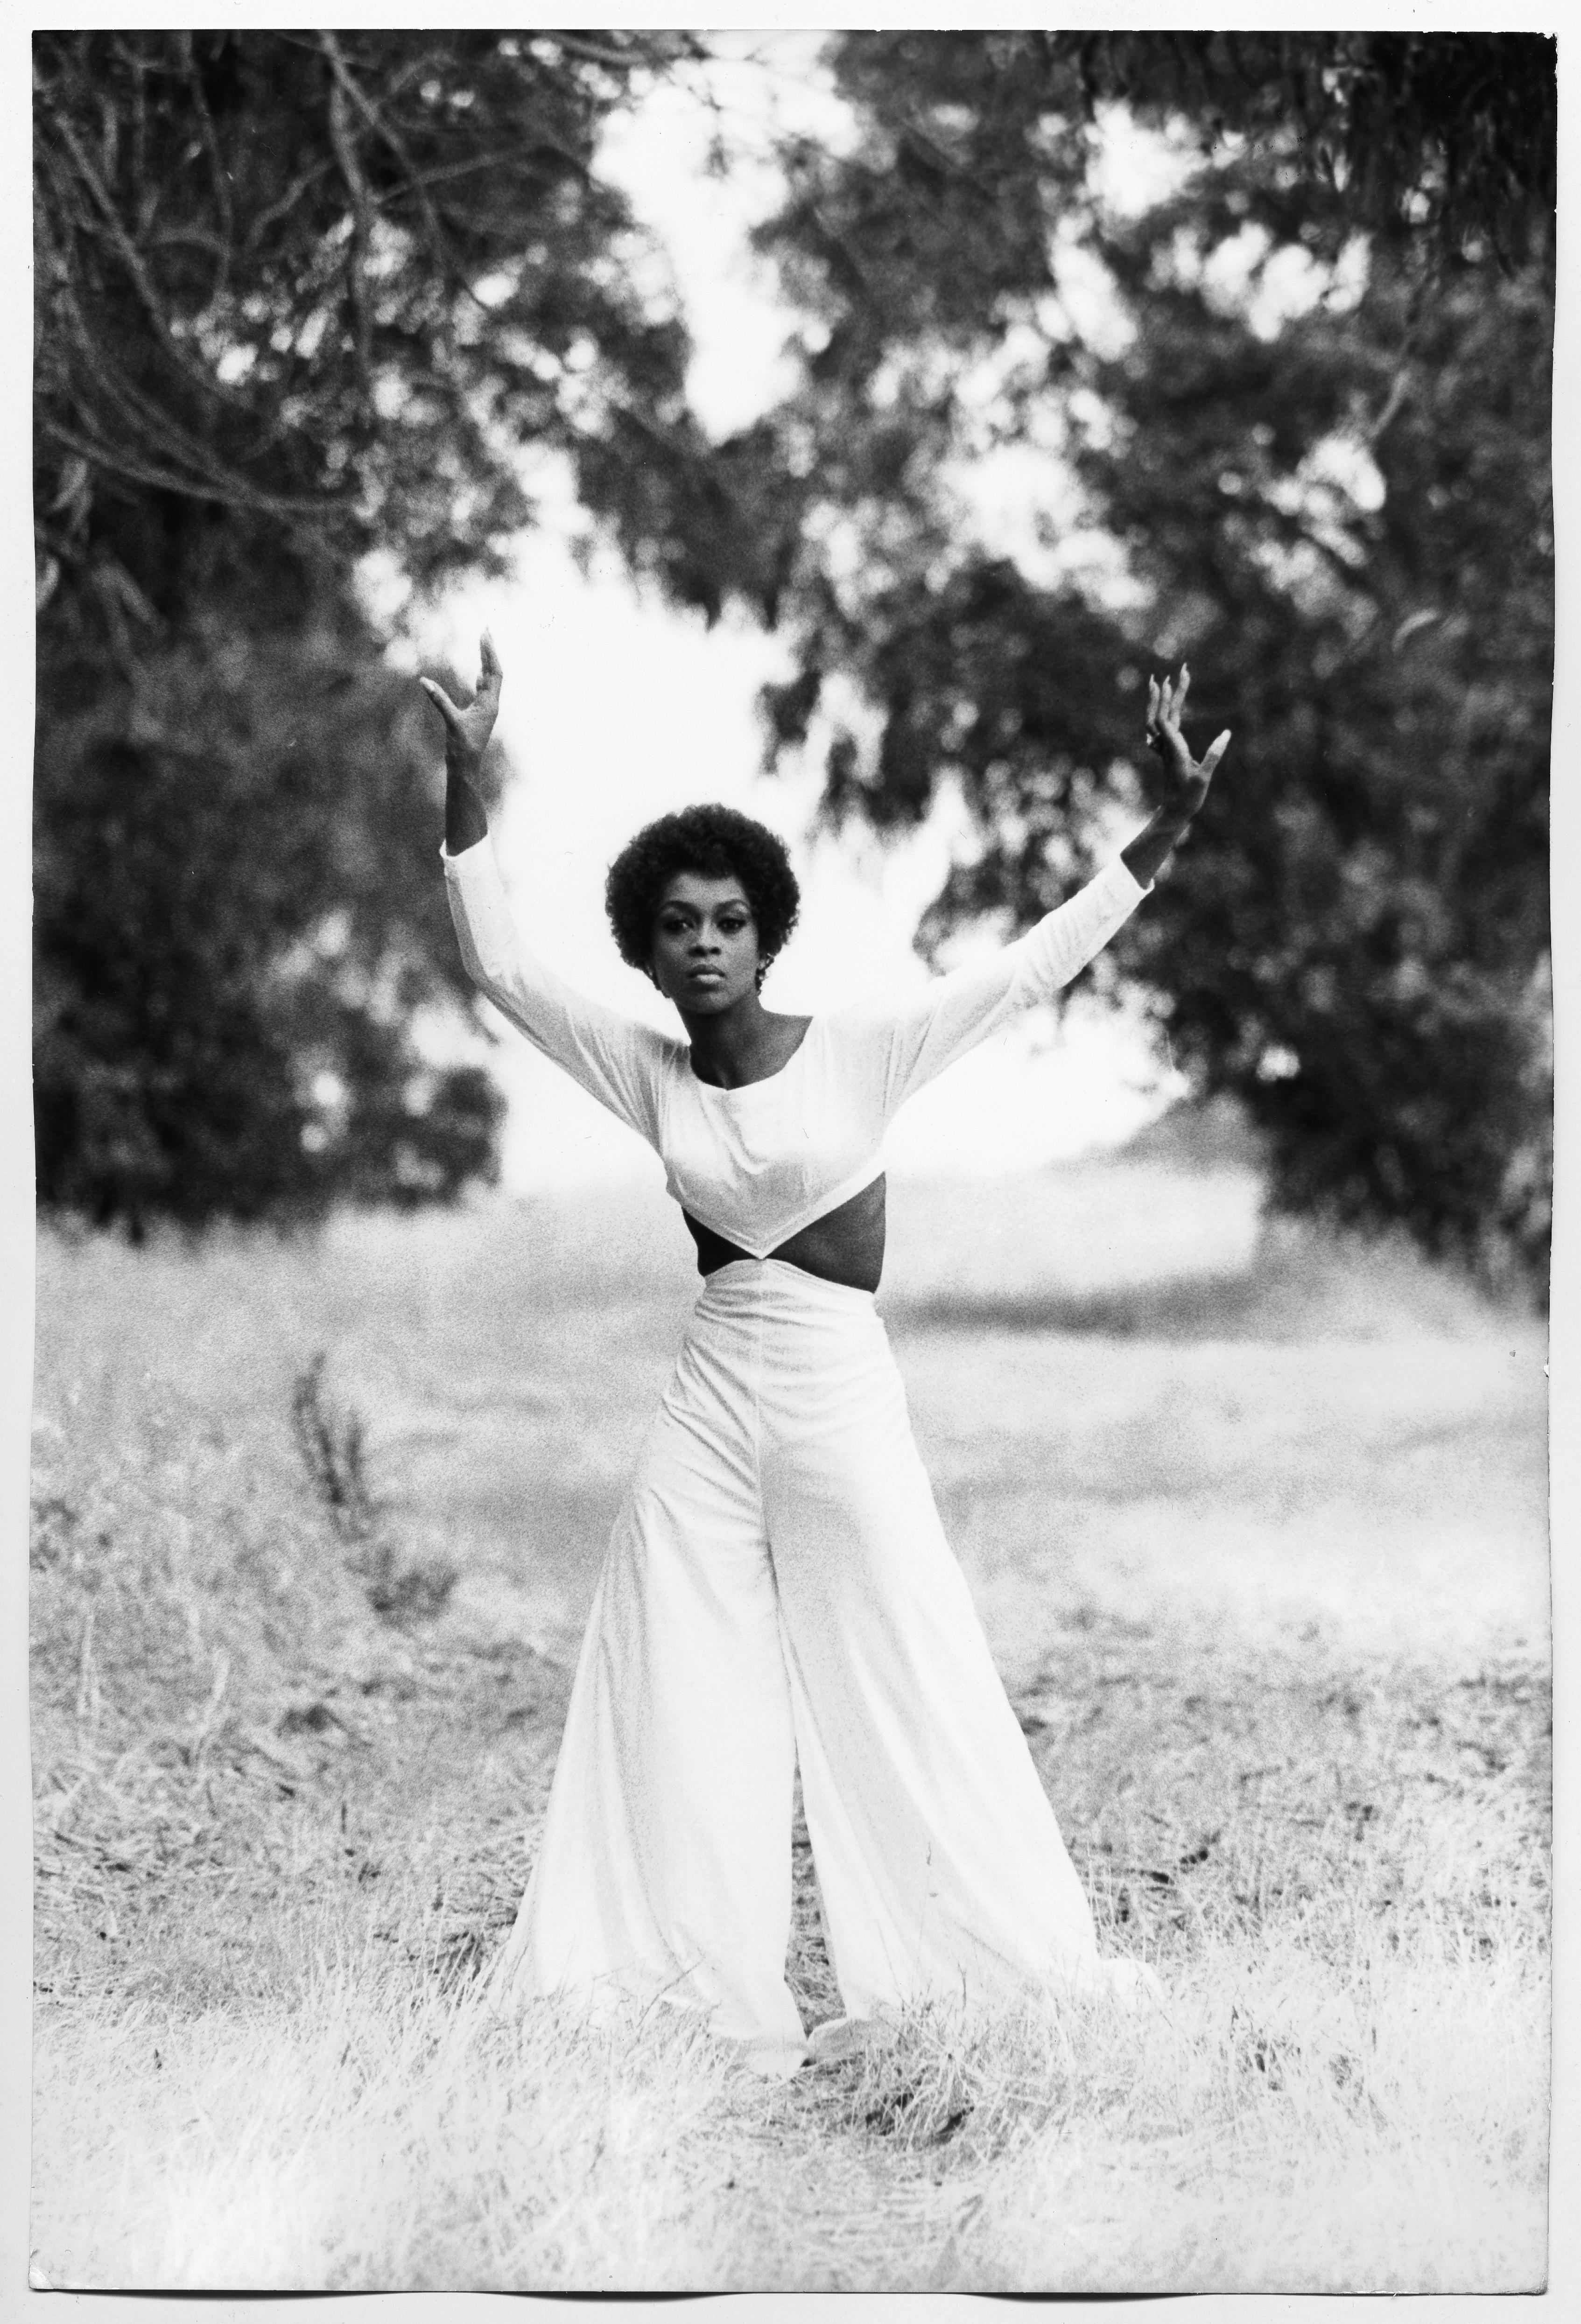 Lola Falana poses in the green photographed by Frank Dandridge, 1969.